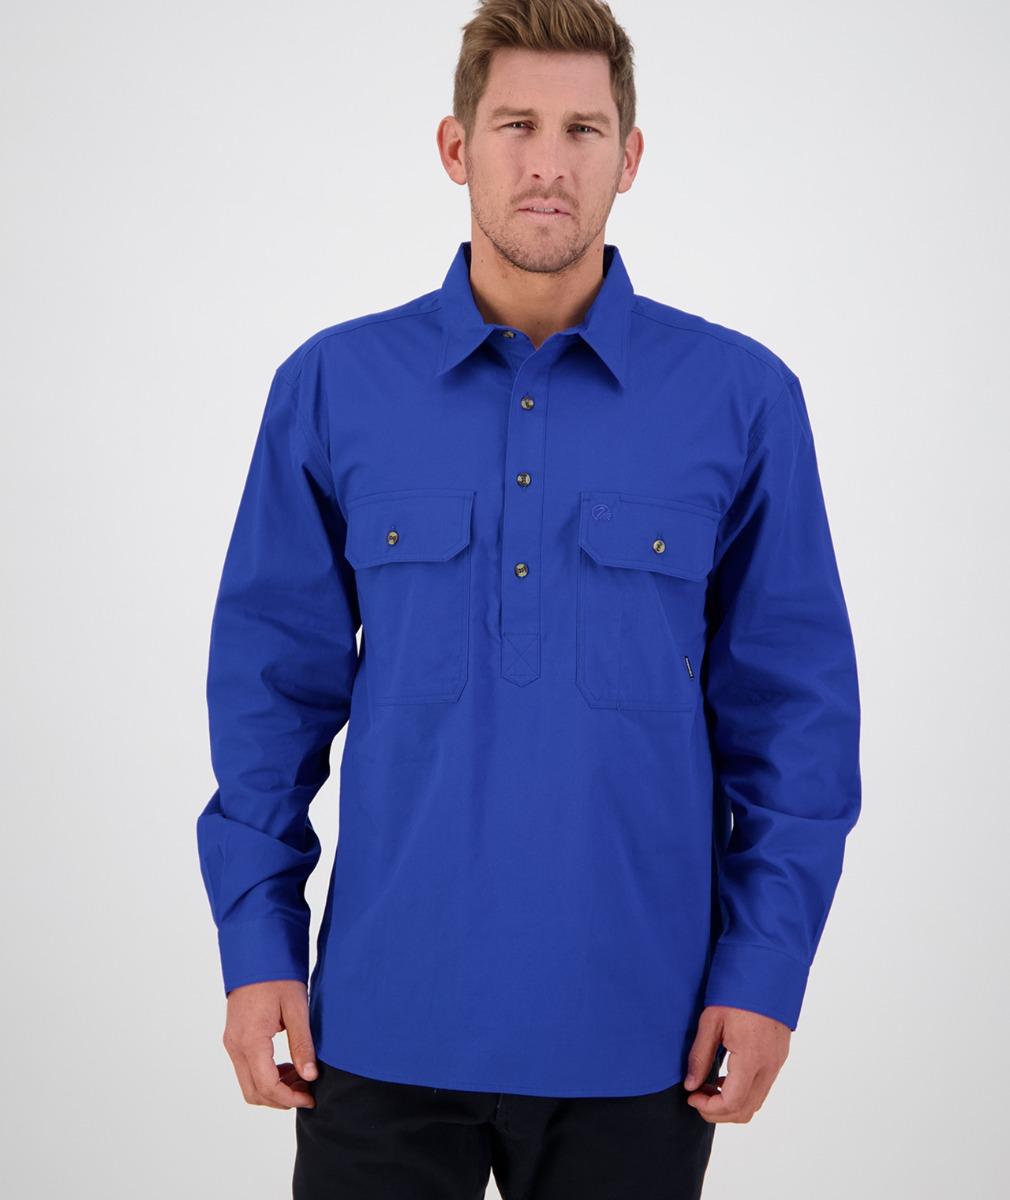 Swanndri Men's Bendigo Long Sleeve Work Shirt in Electric Blue